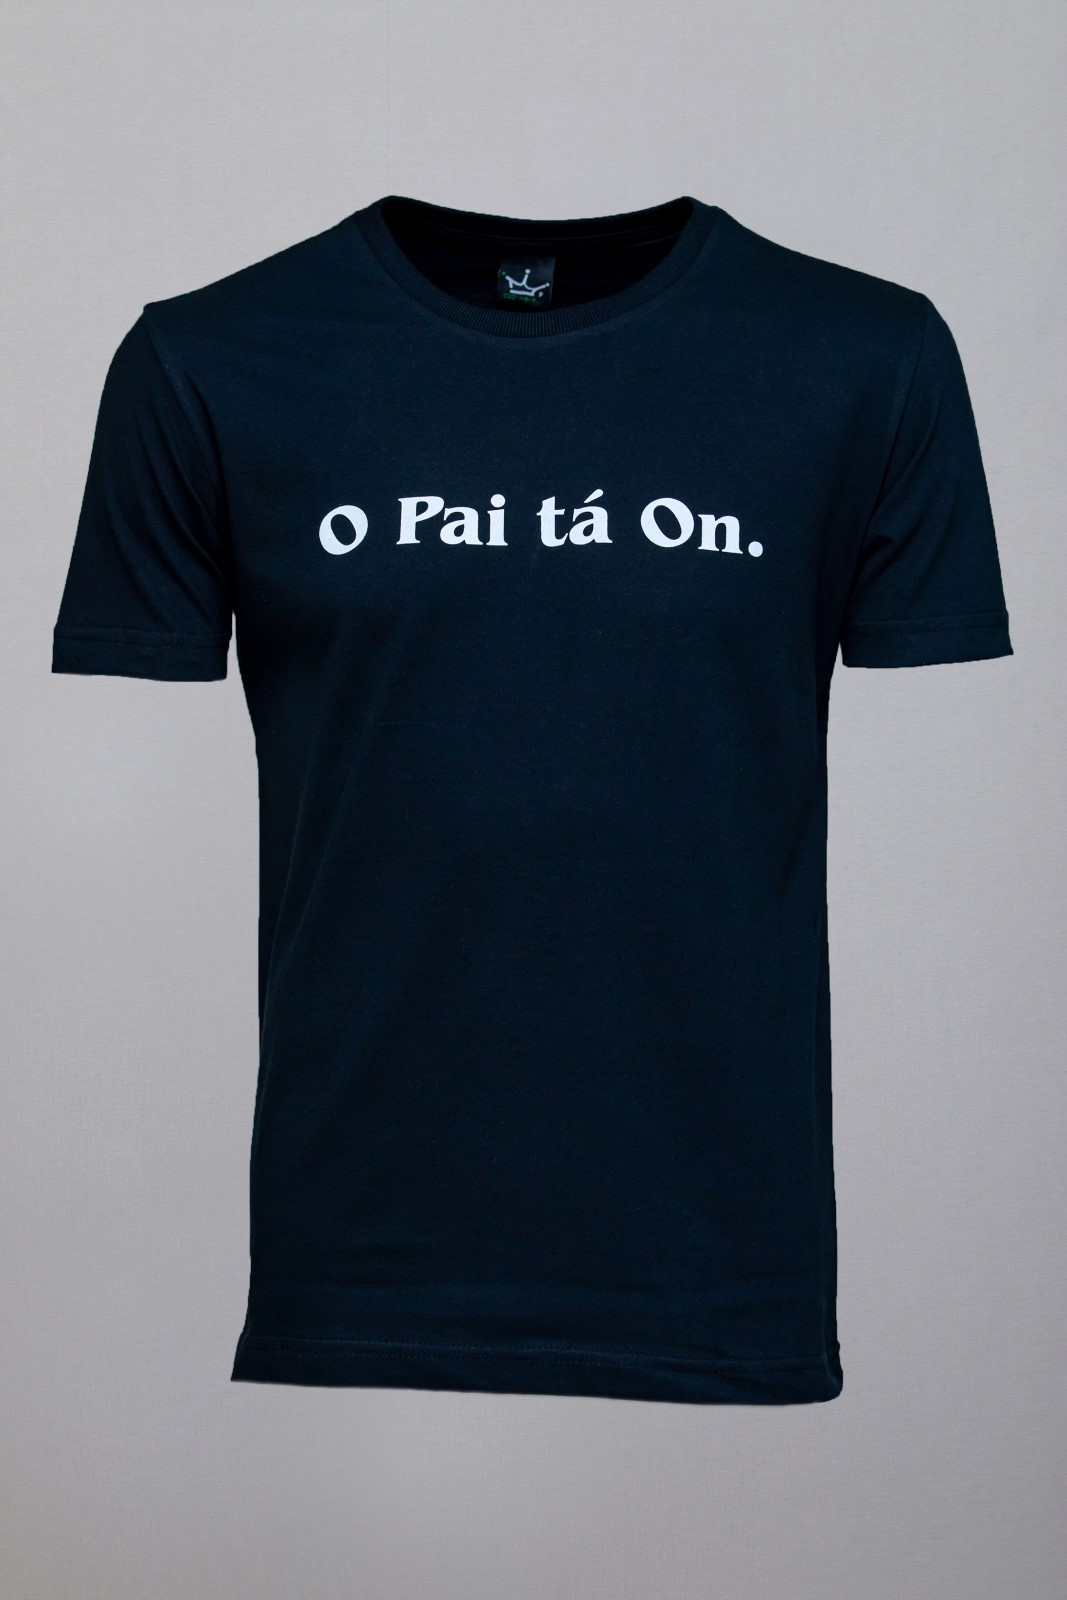 Camiseta CoolWave O Pai Tá On